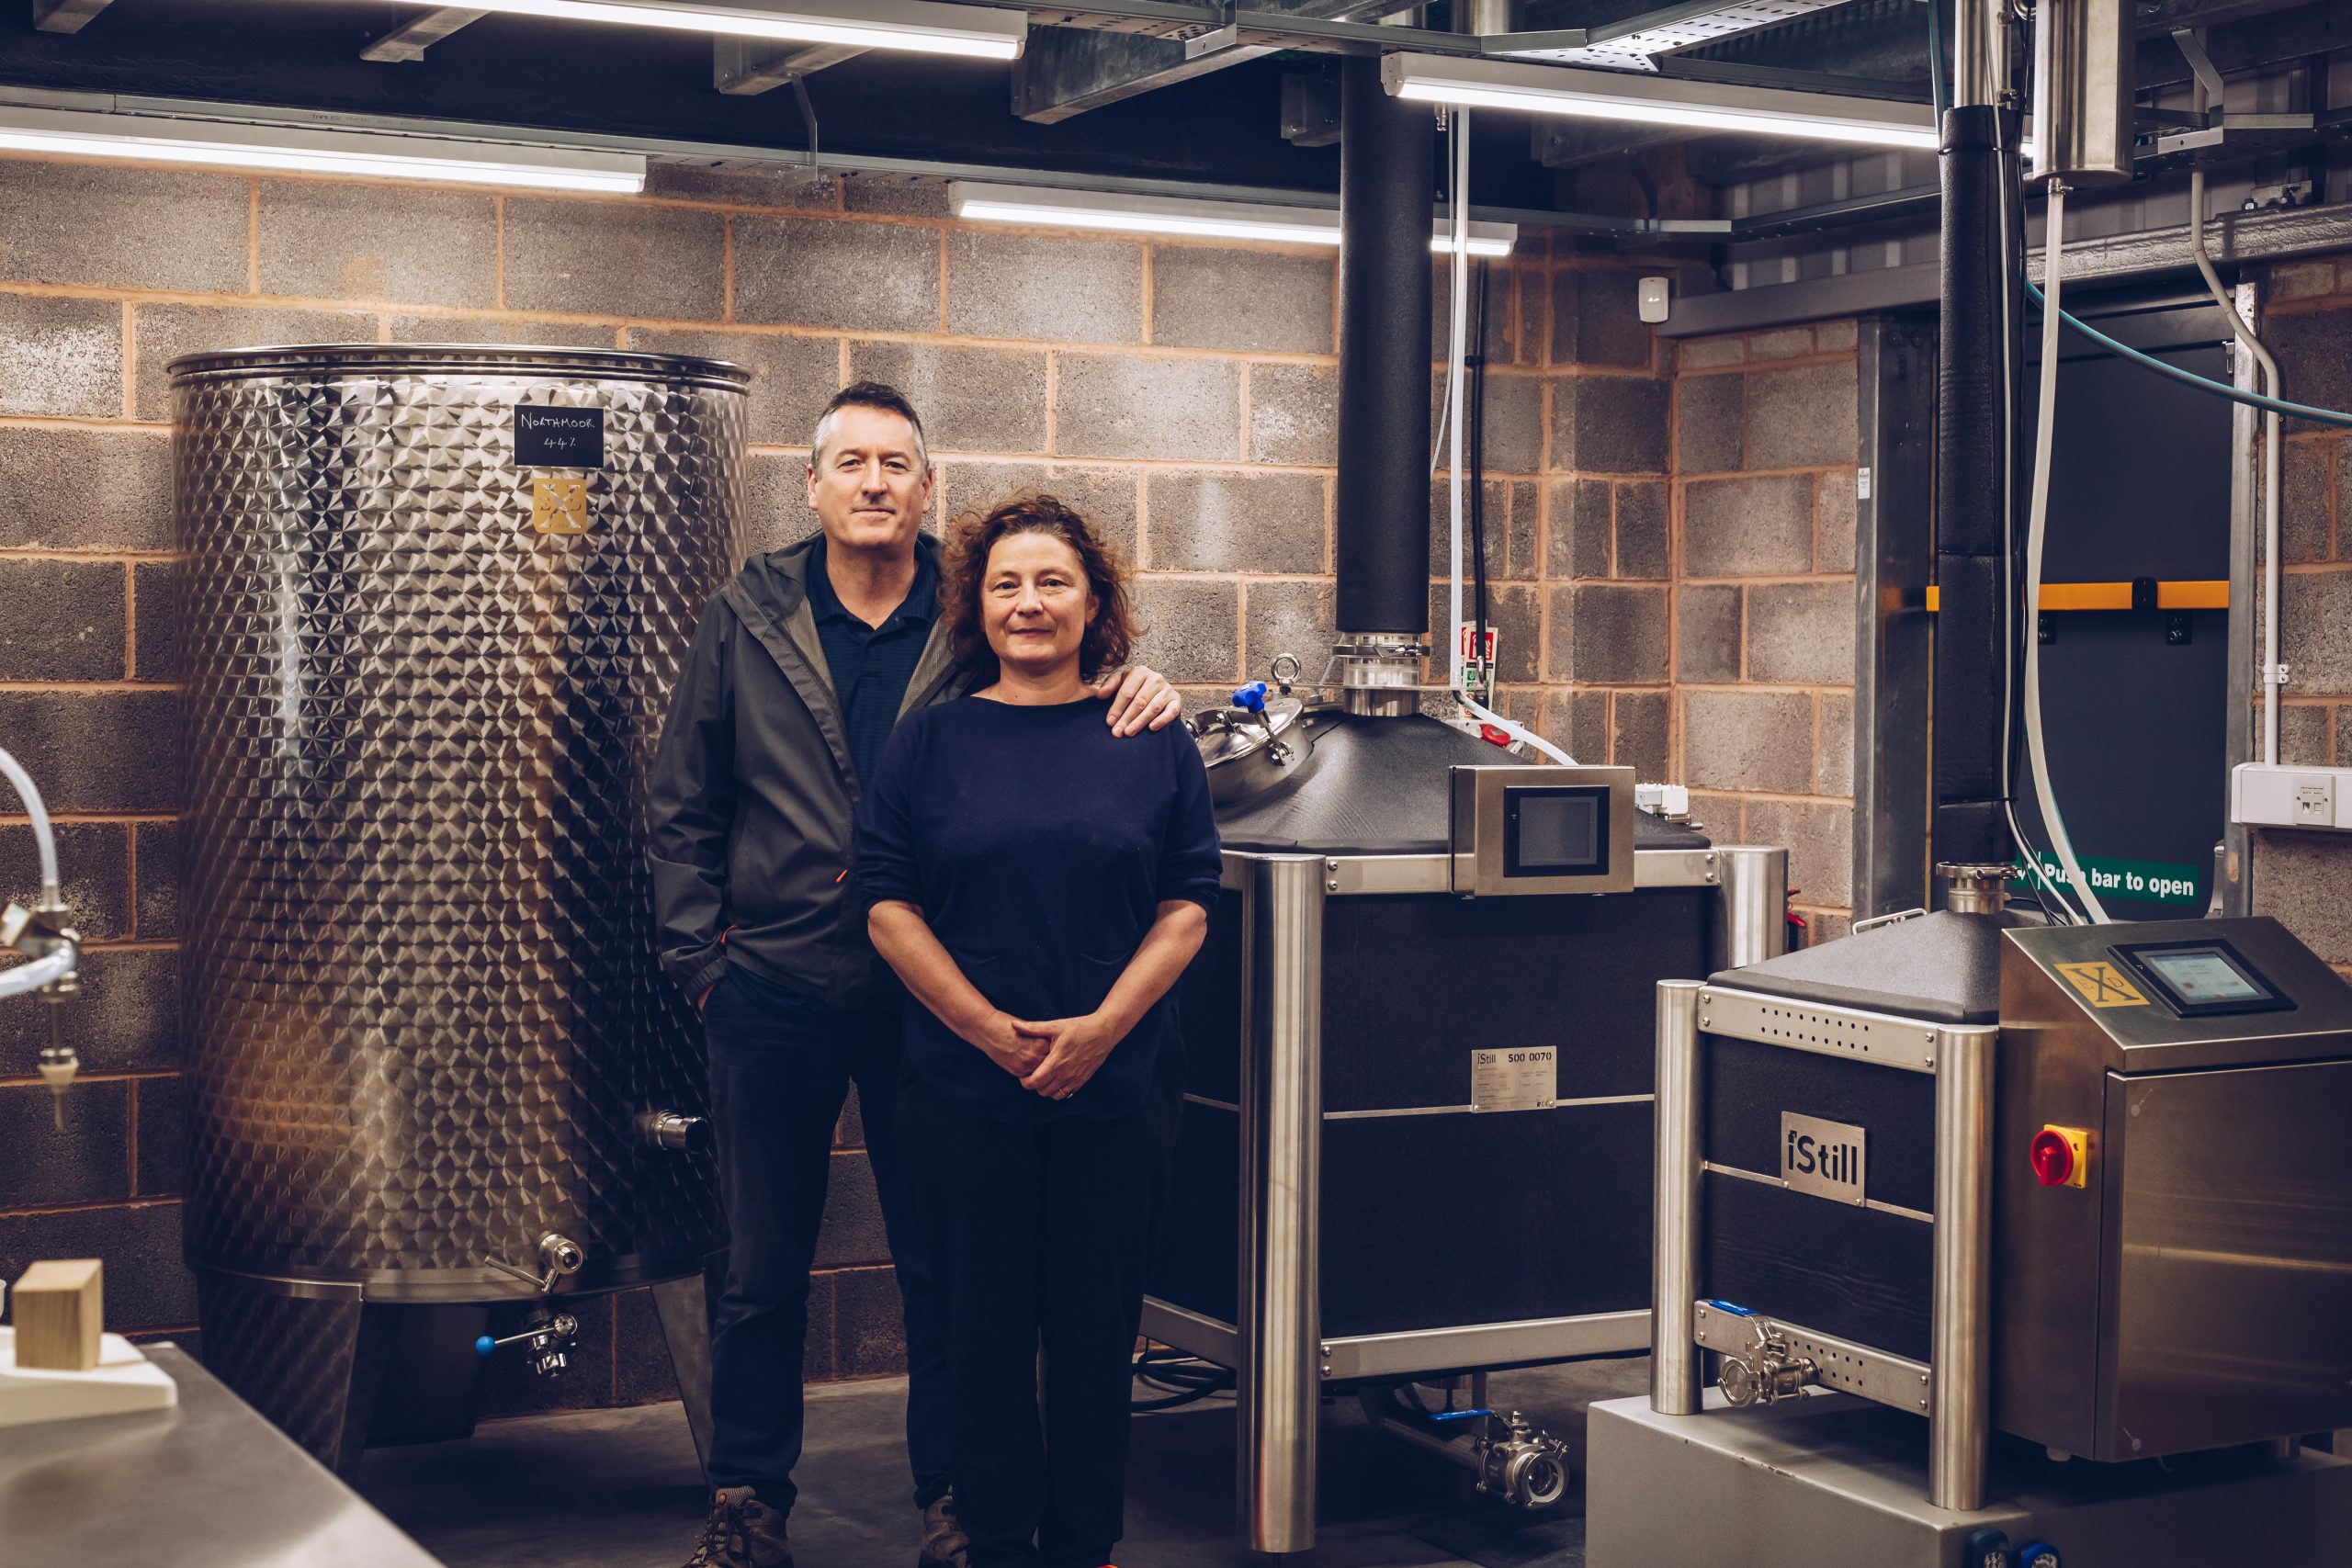 John and Nicola